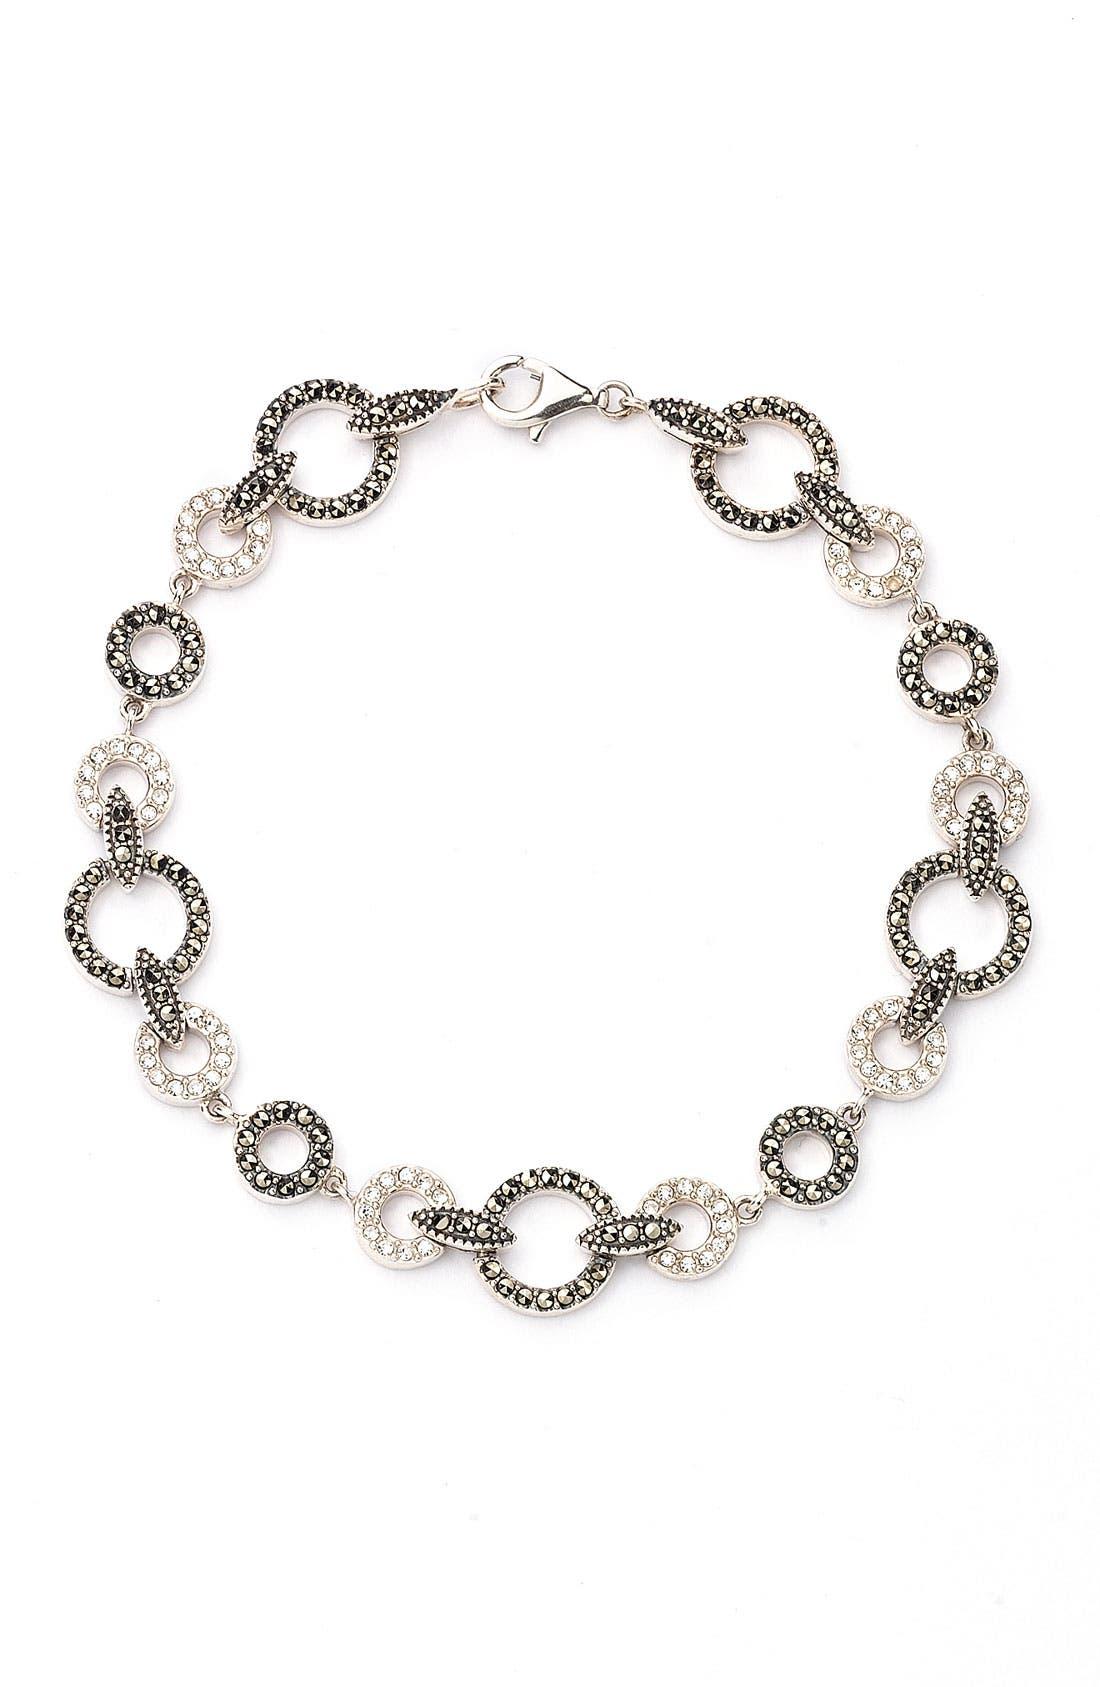 Alternate Image 1 Selected - Judith Jack Circle Link Bracelet